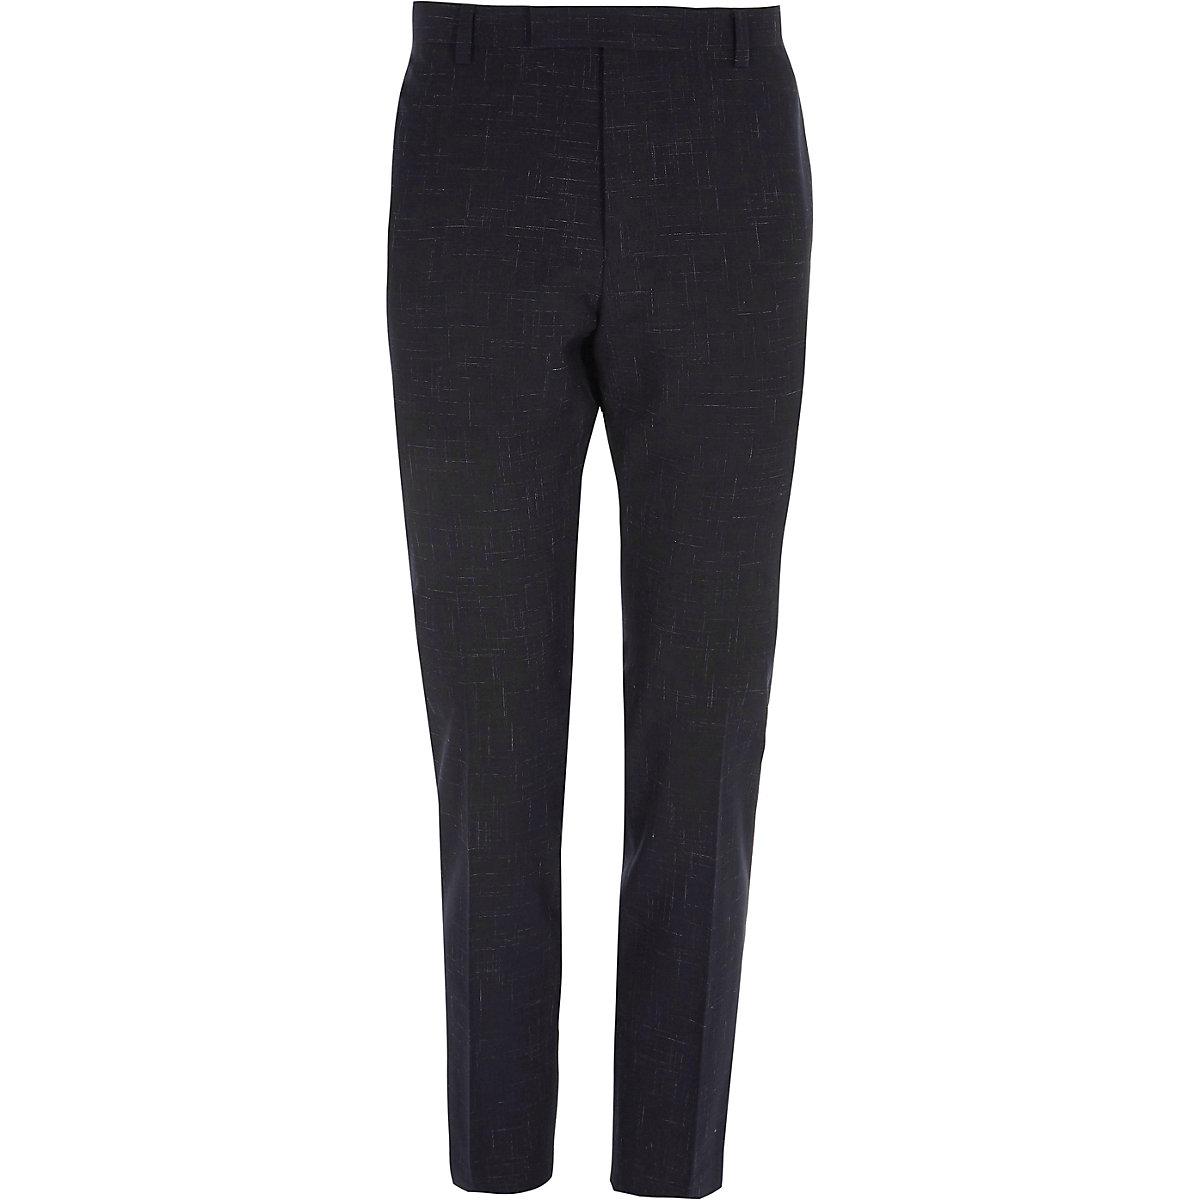 Navy skinny fit suit pants